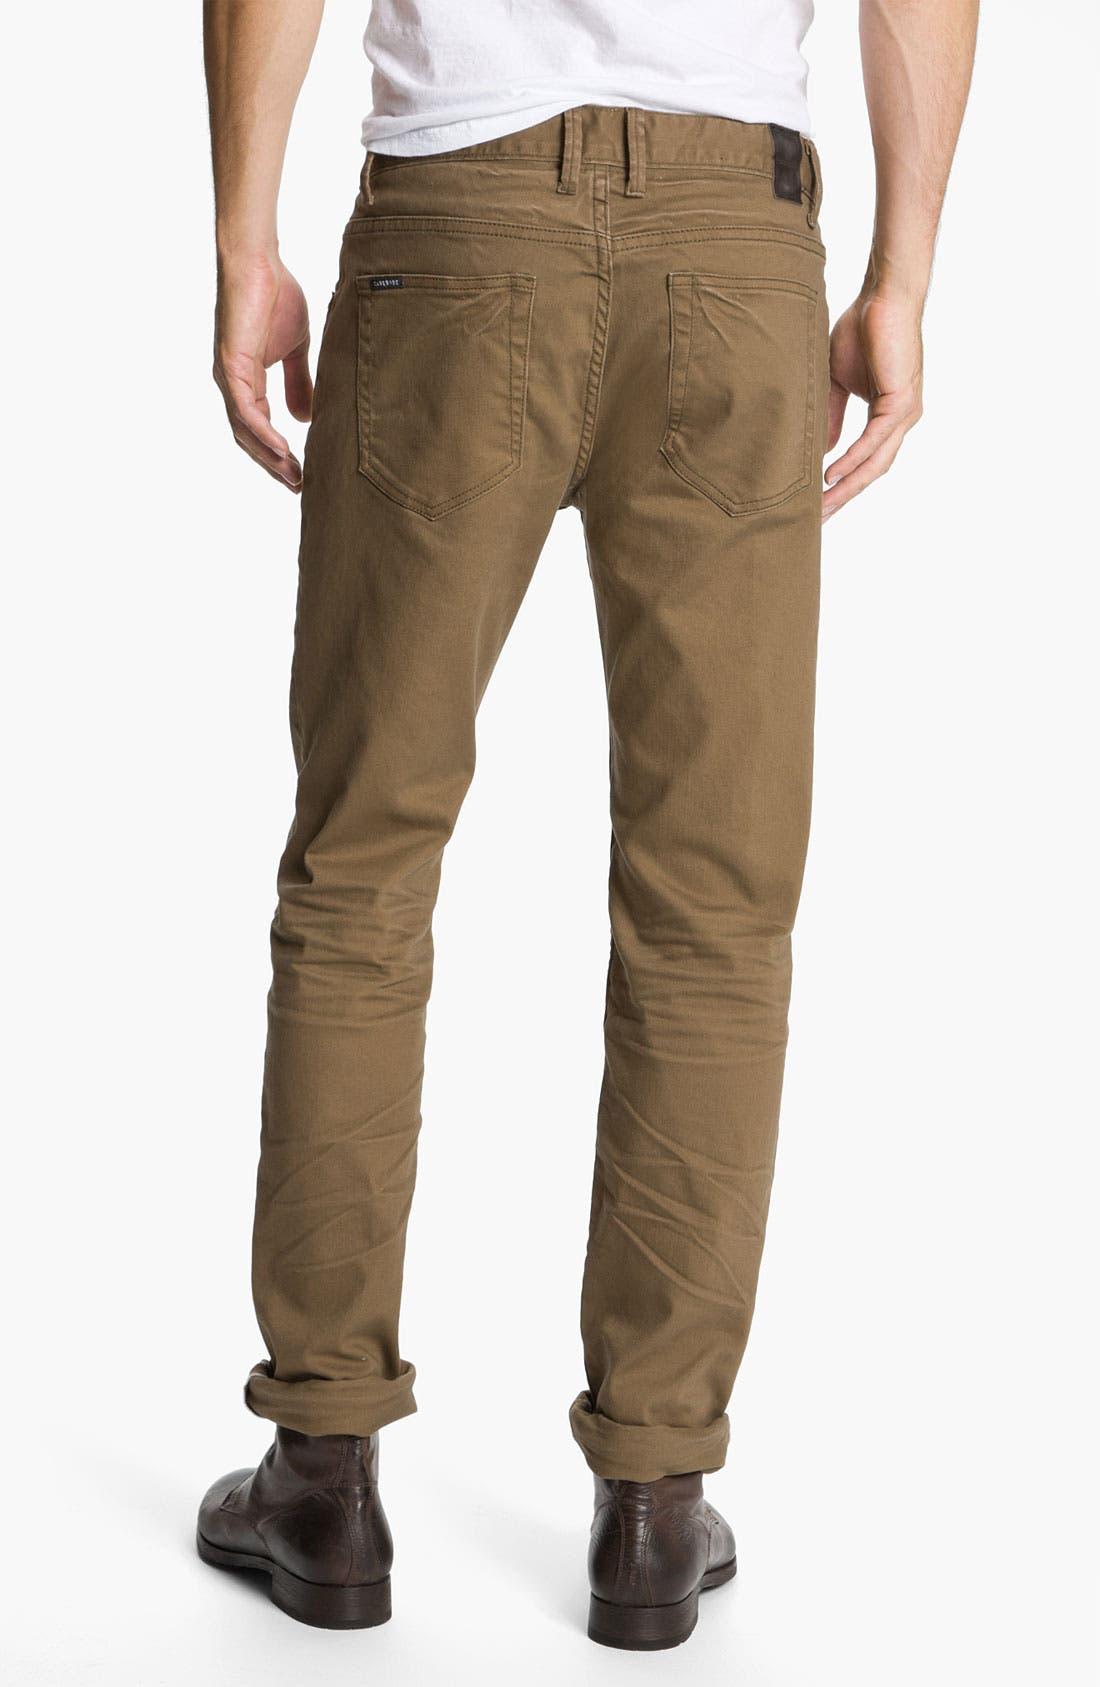 Alternate Image 1 Selected - Zanerobe 'Straight Mate' Slim Straight Leg Jeans (Tan)